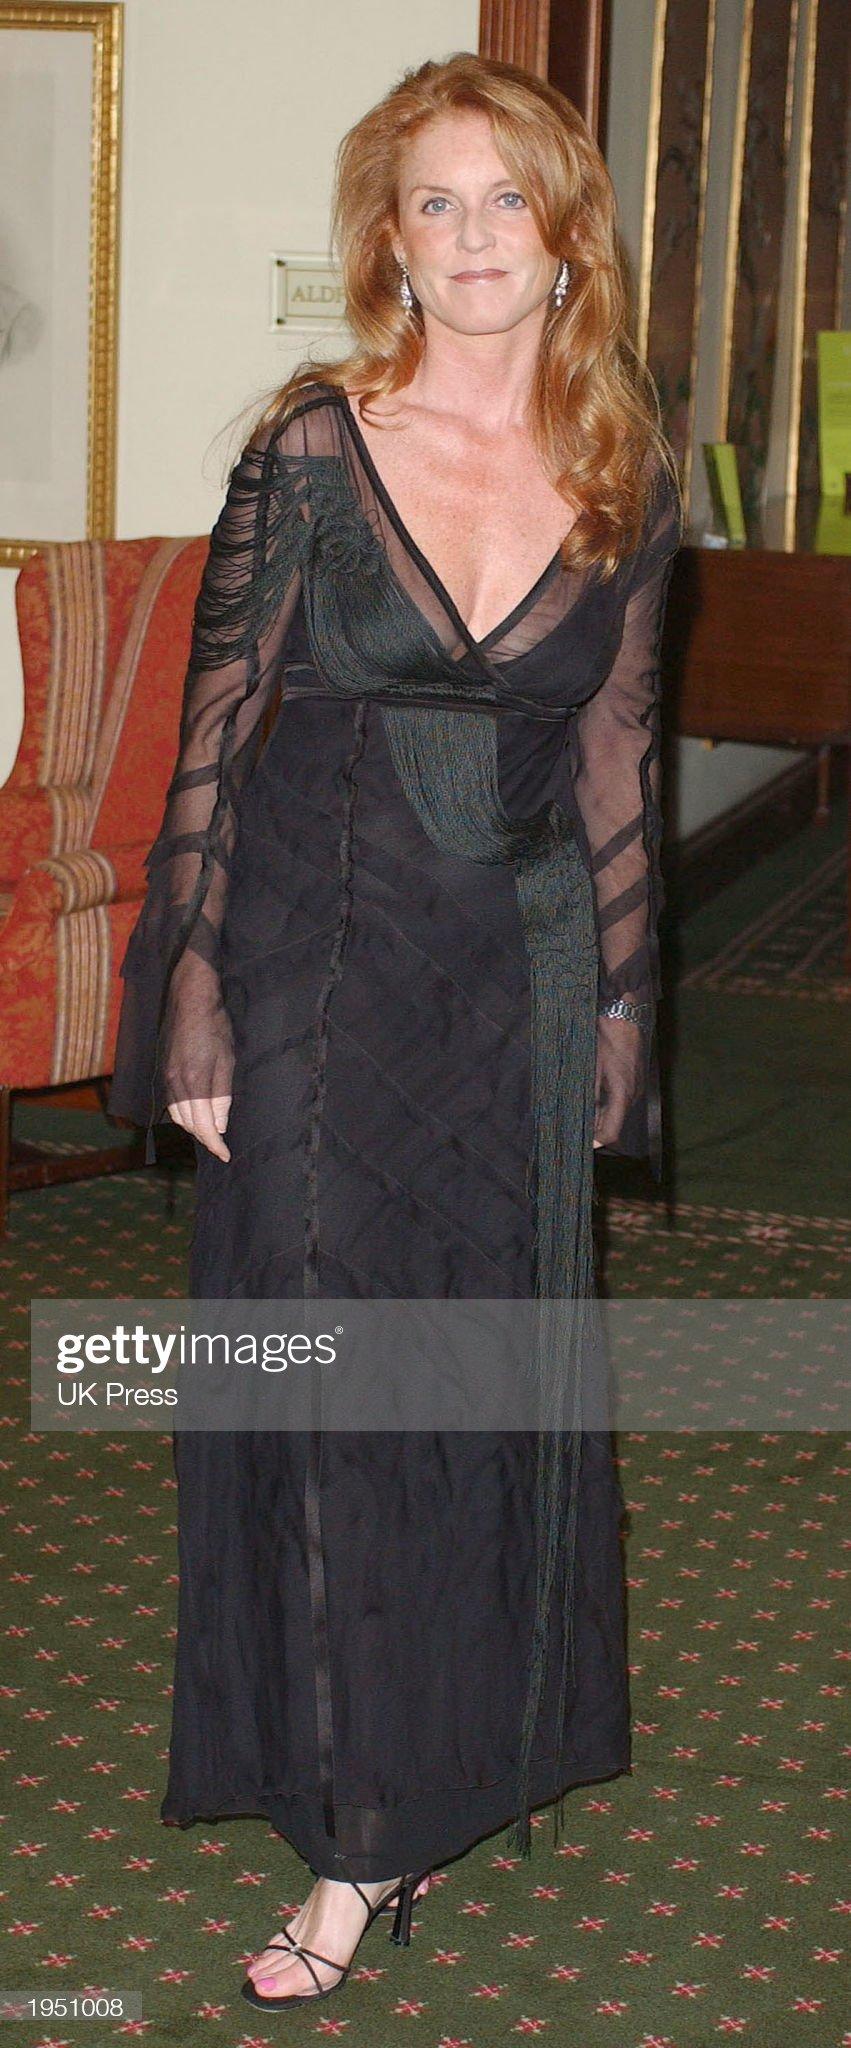 The Duchess of York Sarah Ferguson At Dinner : News Photo